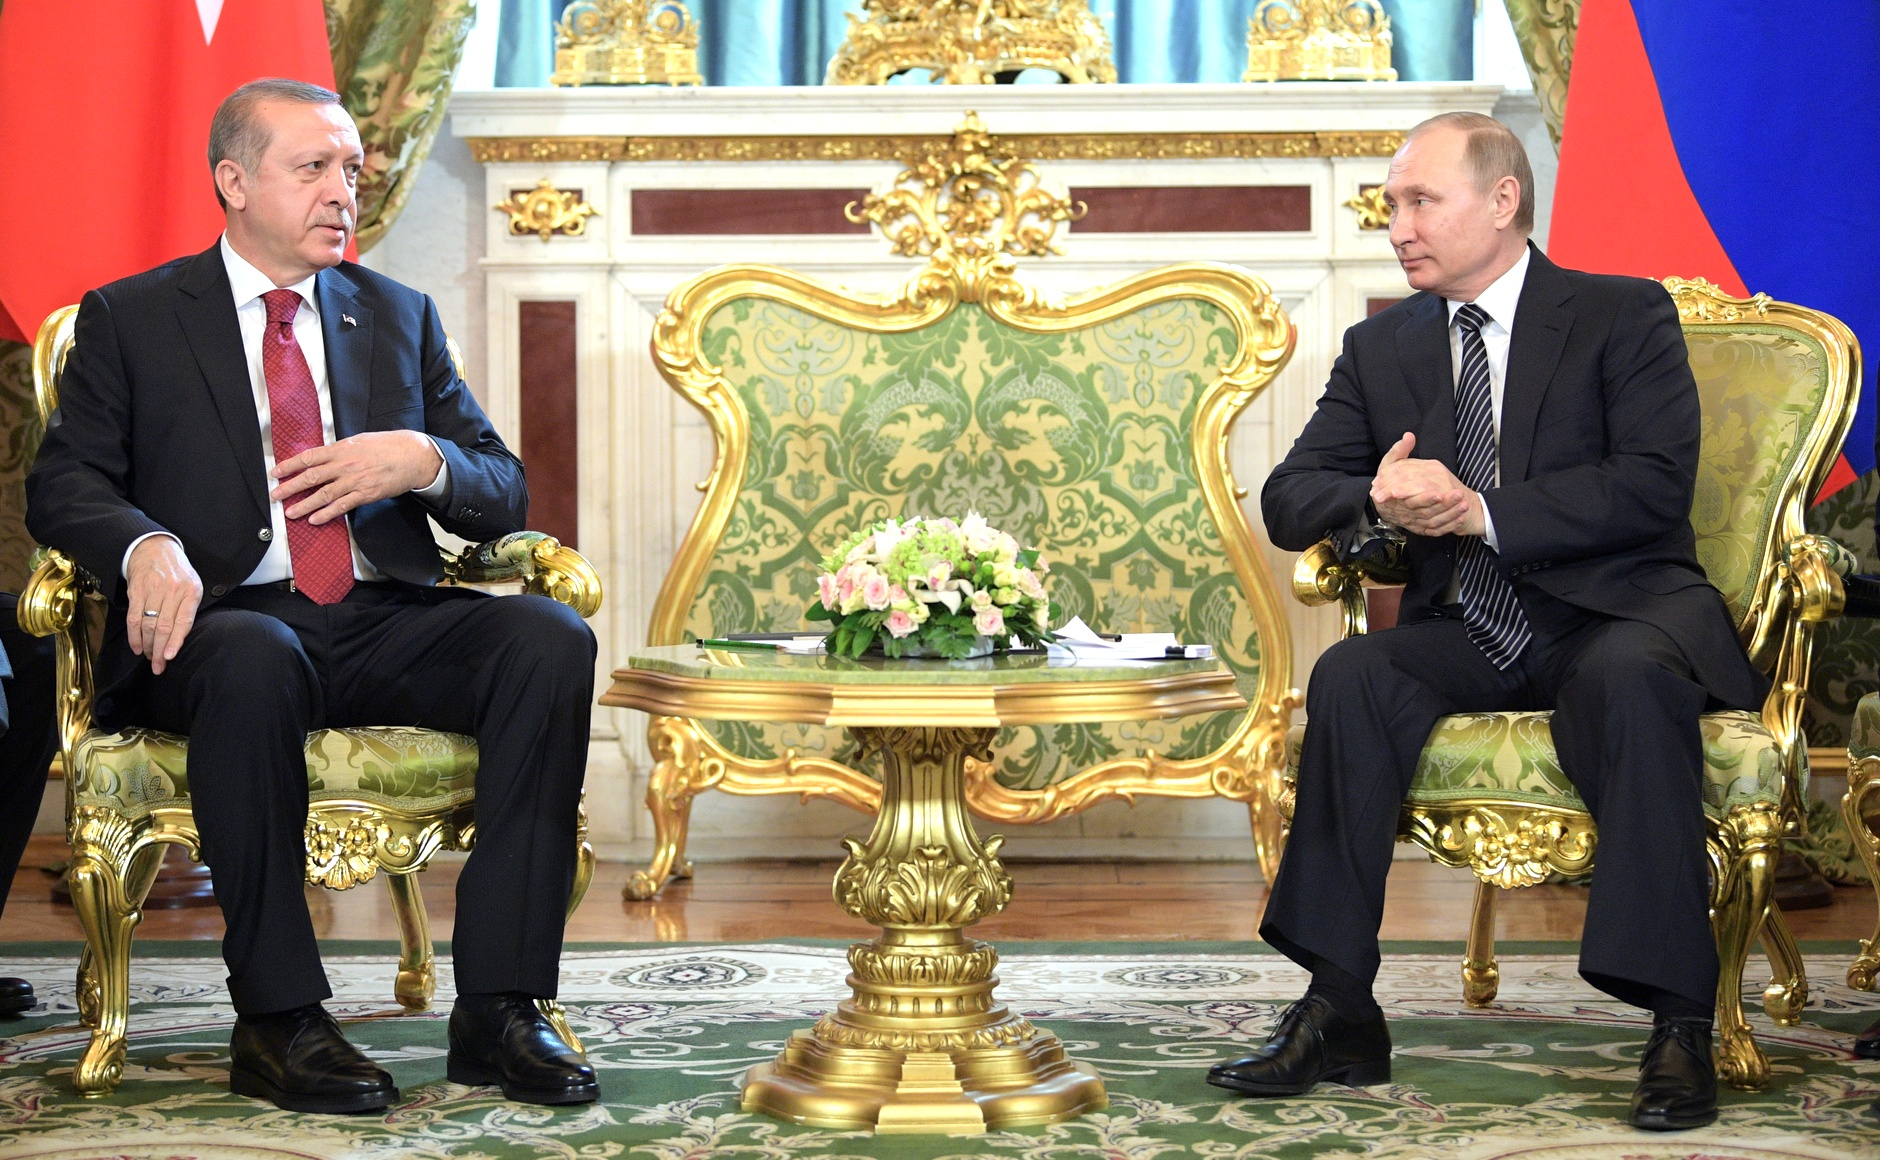 Vladimir Putin meets with Recep Tayyip Erdogan.